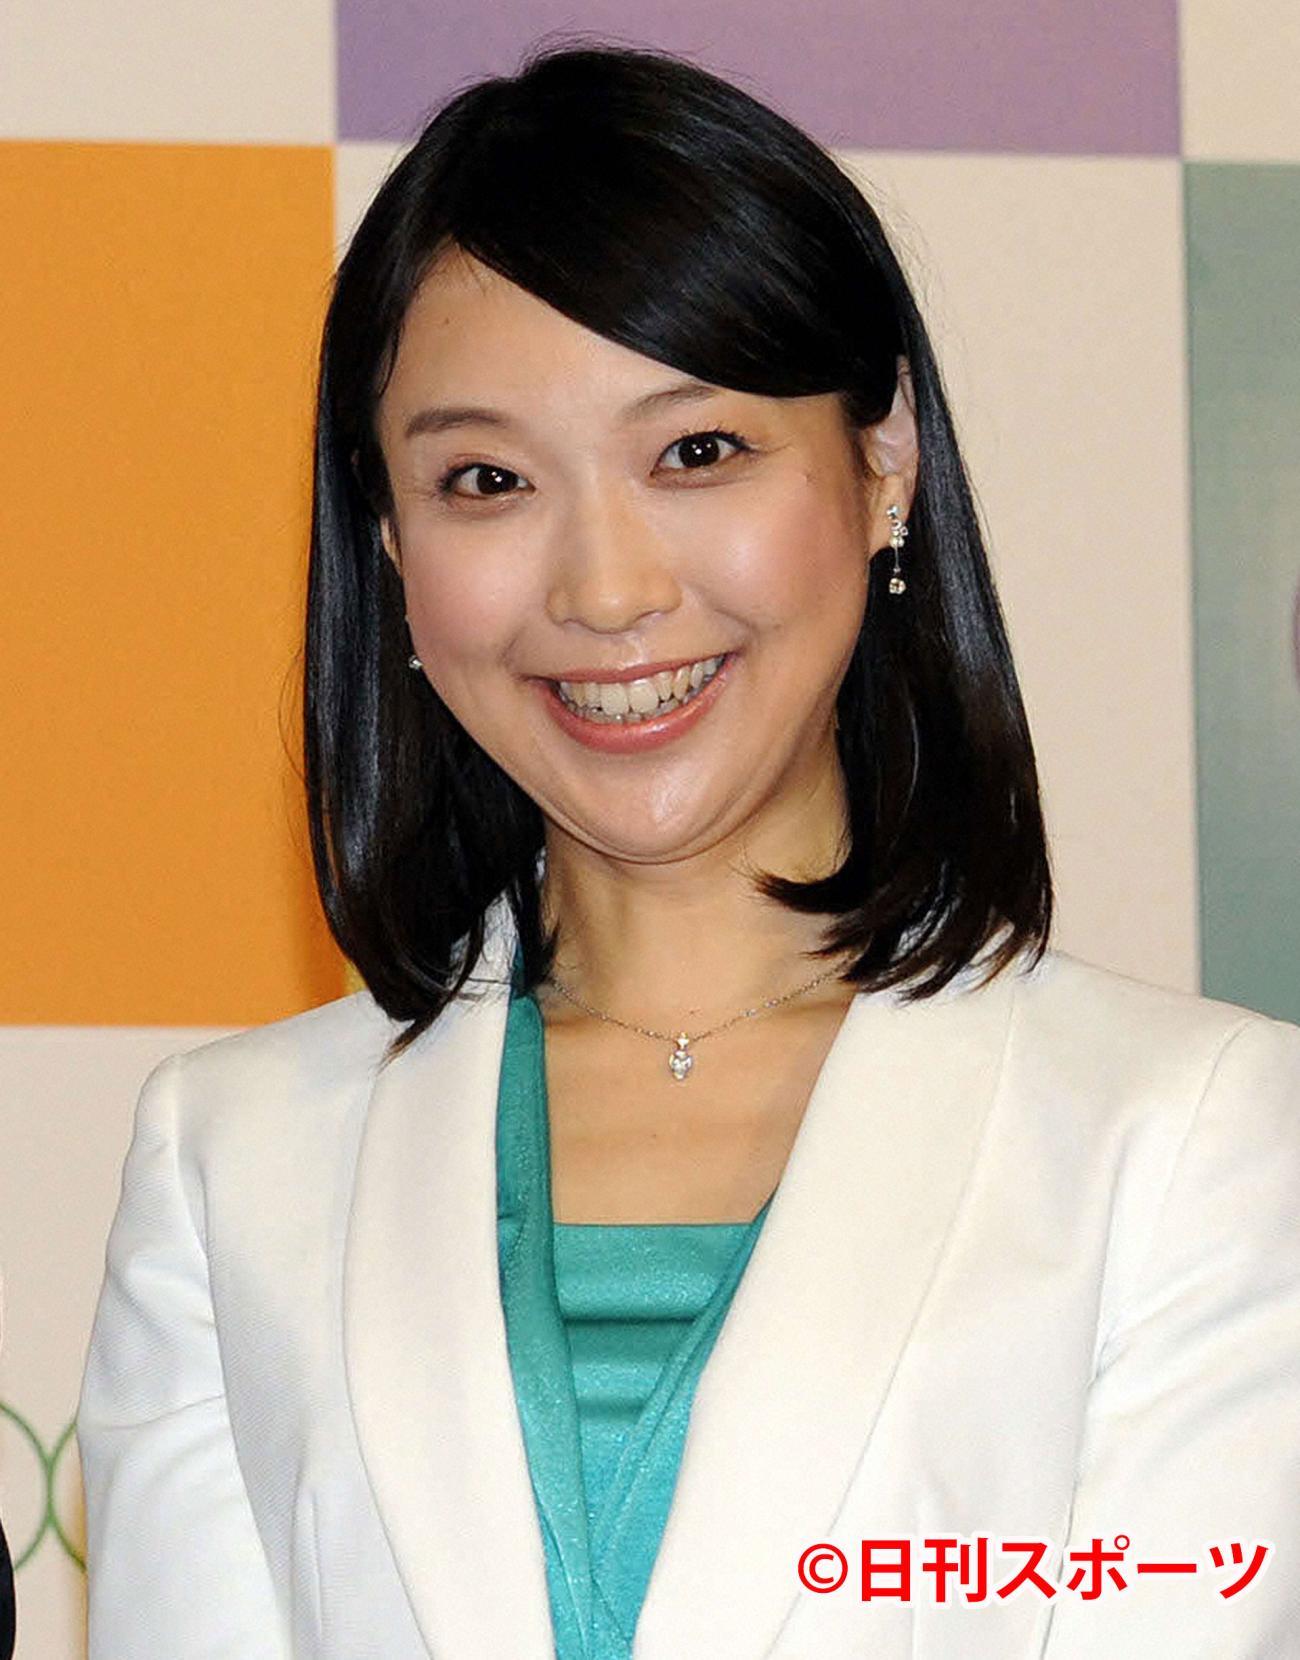 NHK守本奈実アナが妊娠 後任に橋本奈穂子アナ - 女子アナ : 日刊 ...